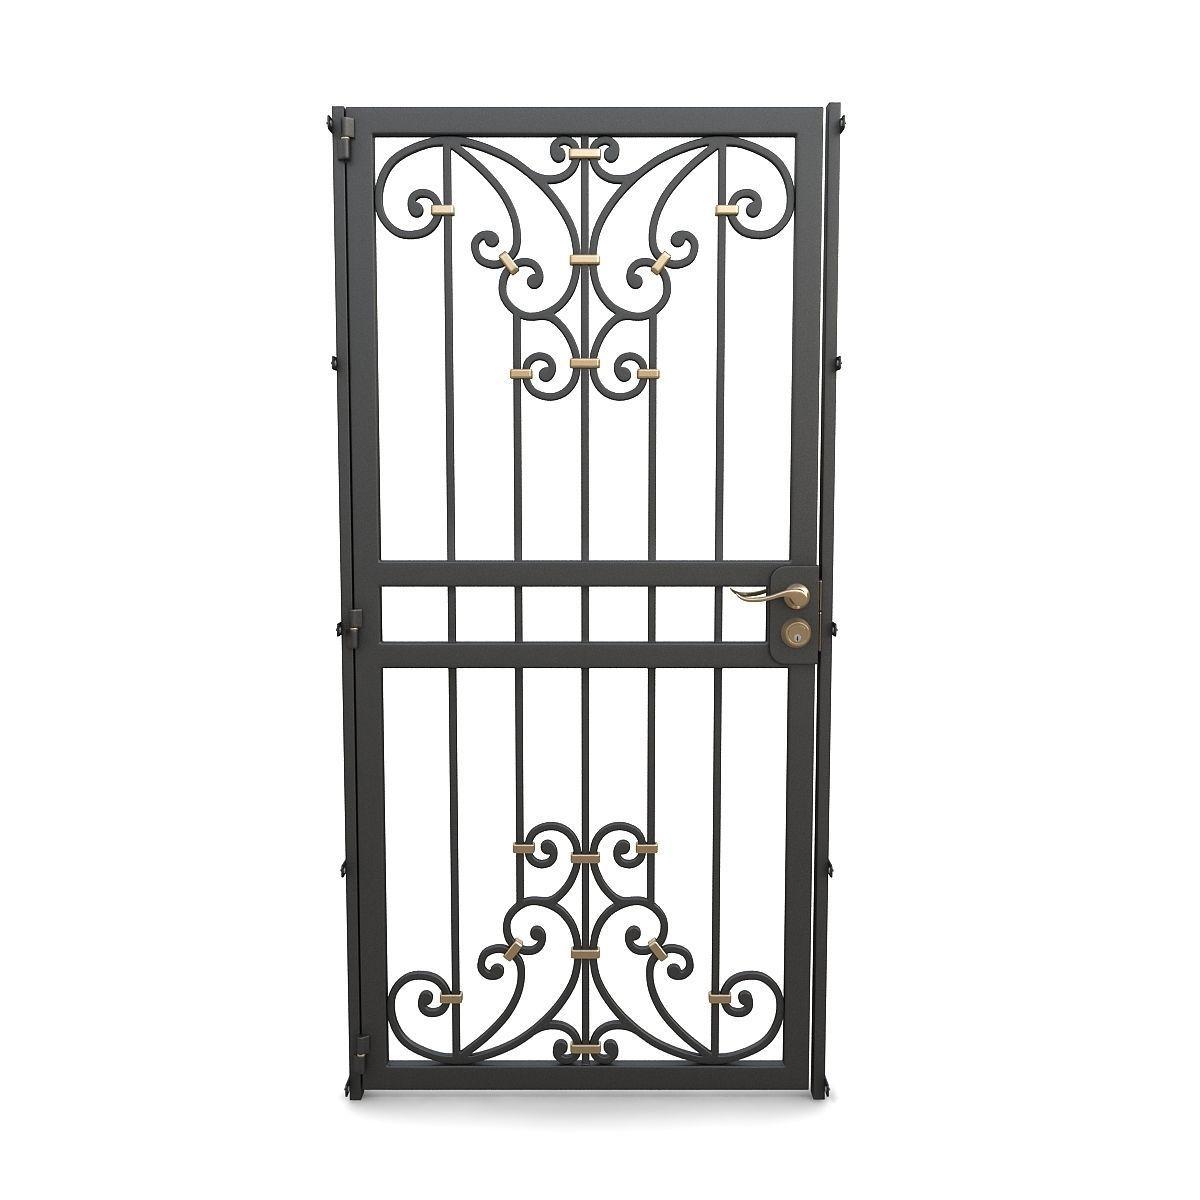 Wrought iron gate 12